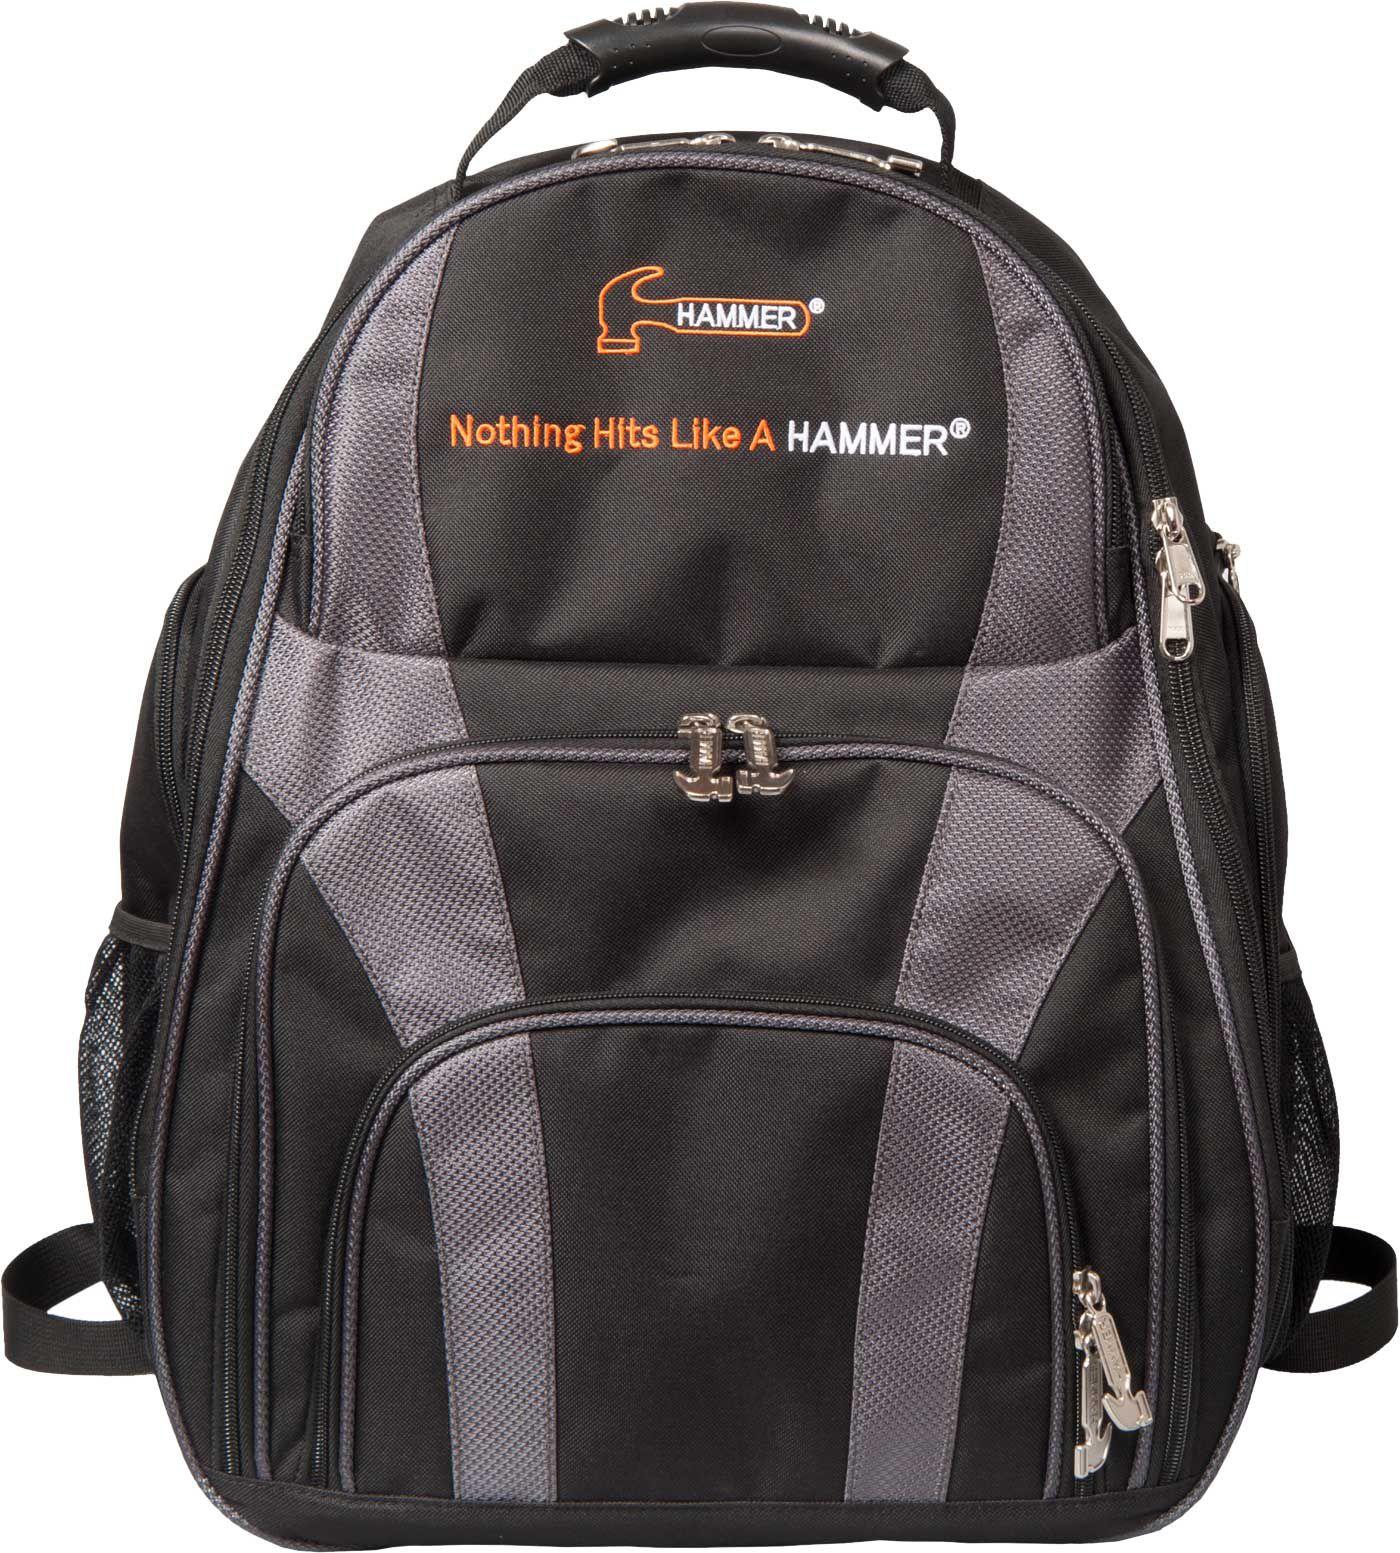 Hammer Deuce 2-Ball Backpack Bowling Bag